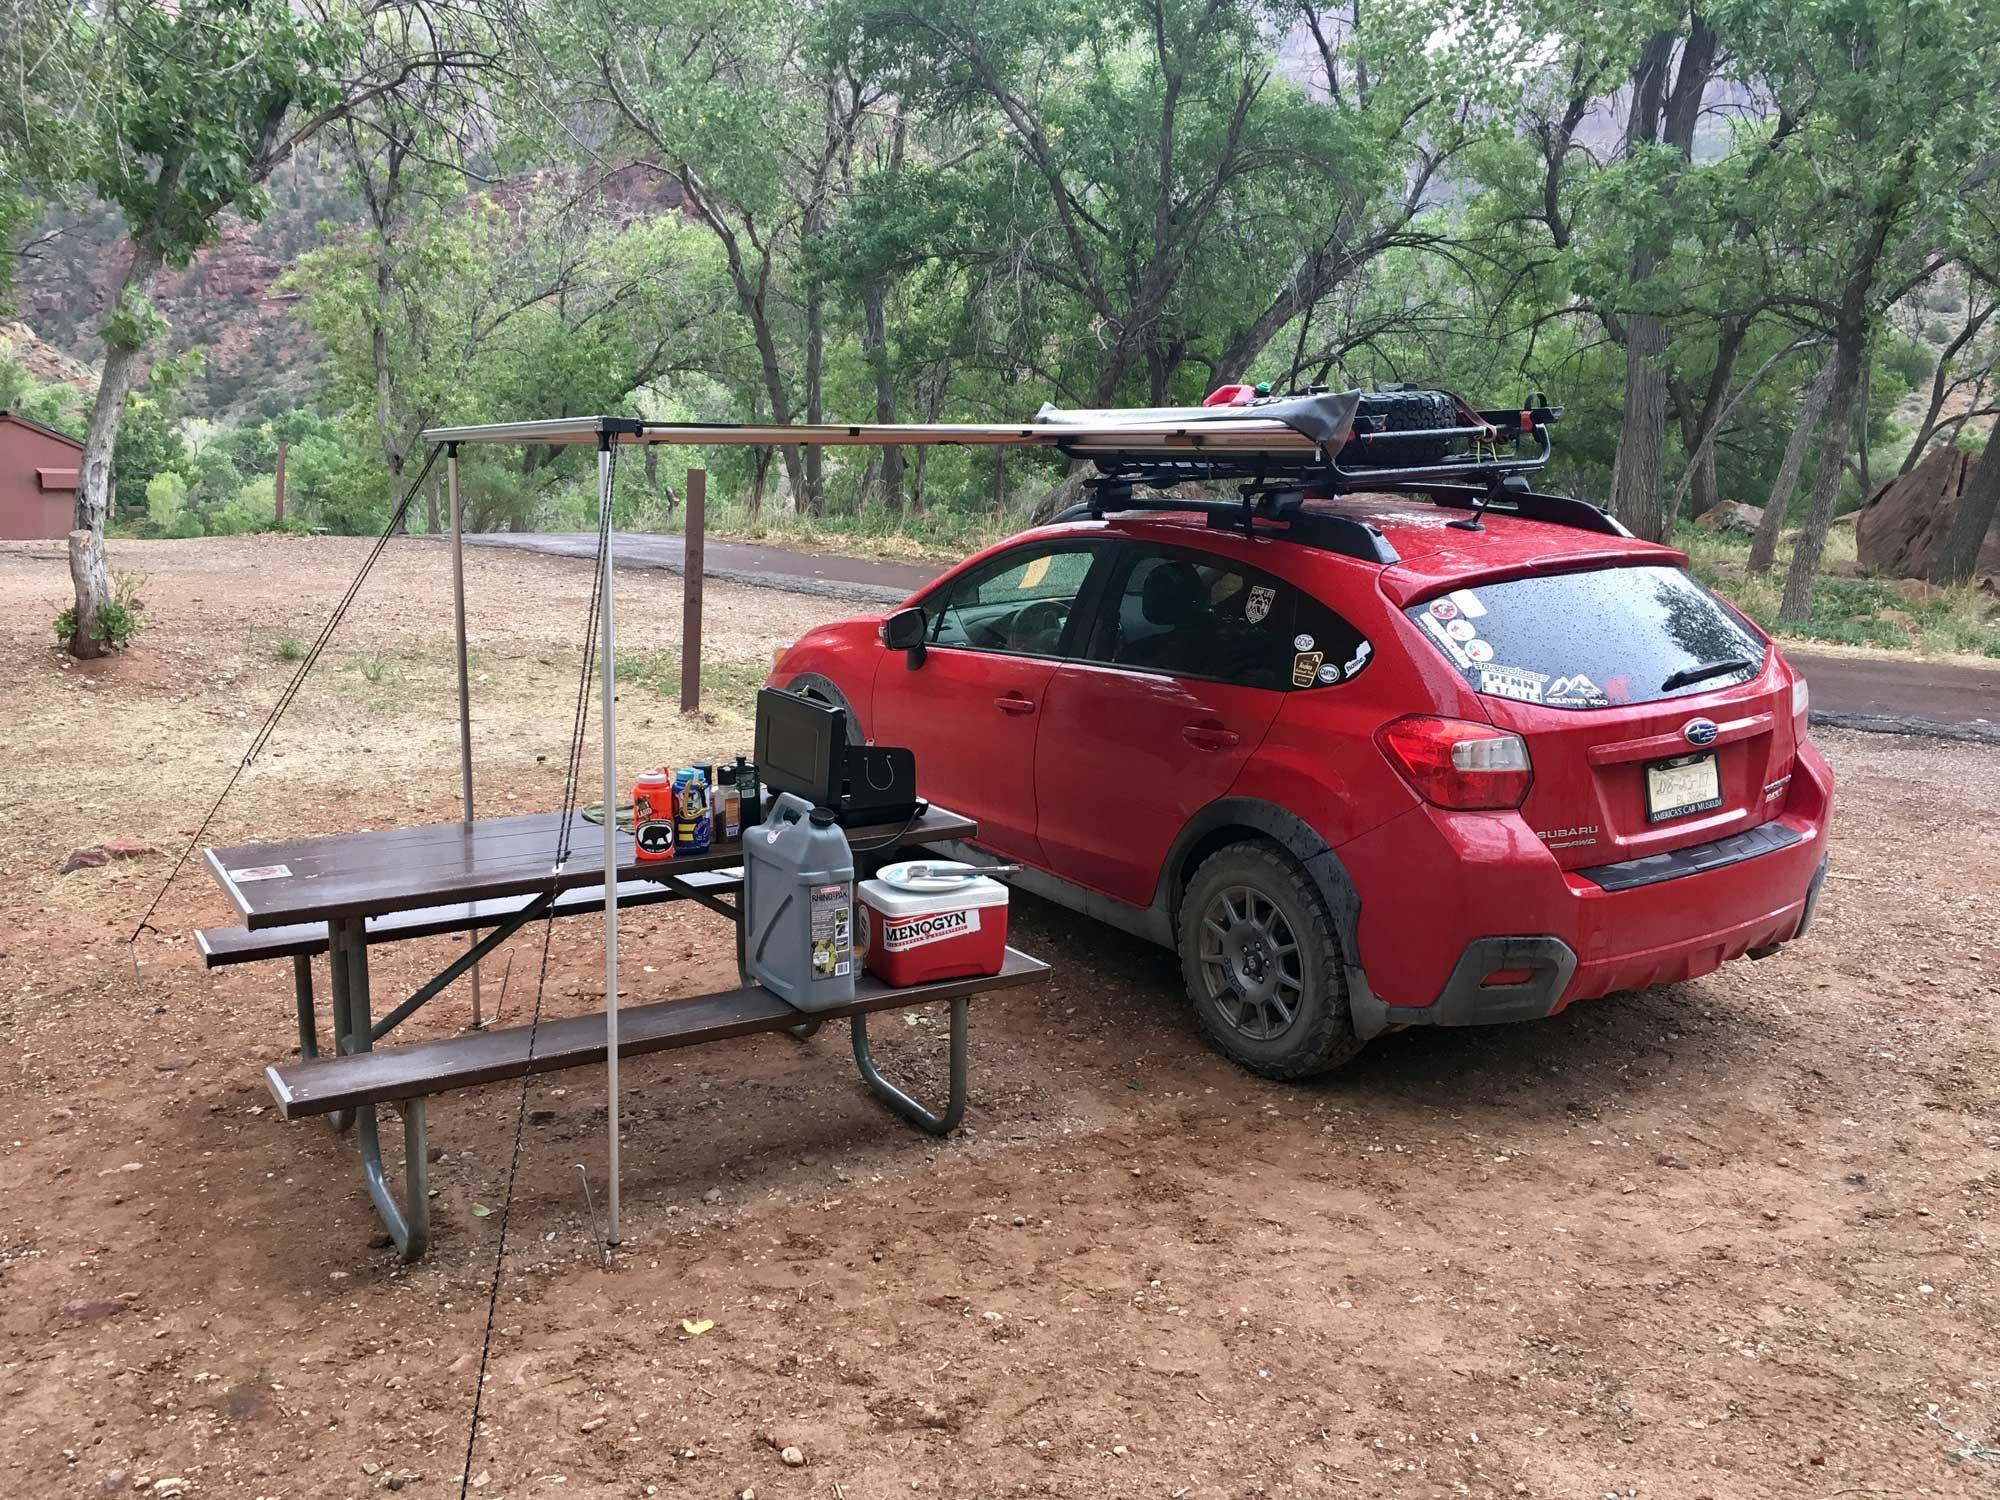 Subaru Crosstrek ARB Awning